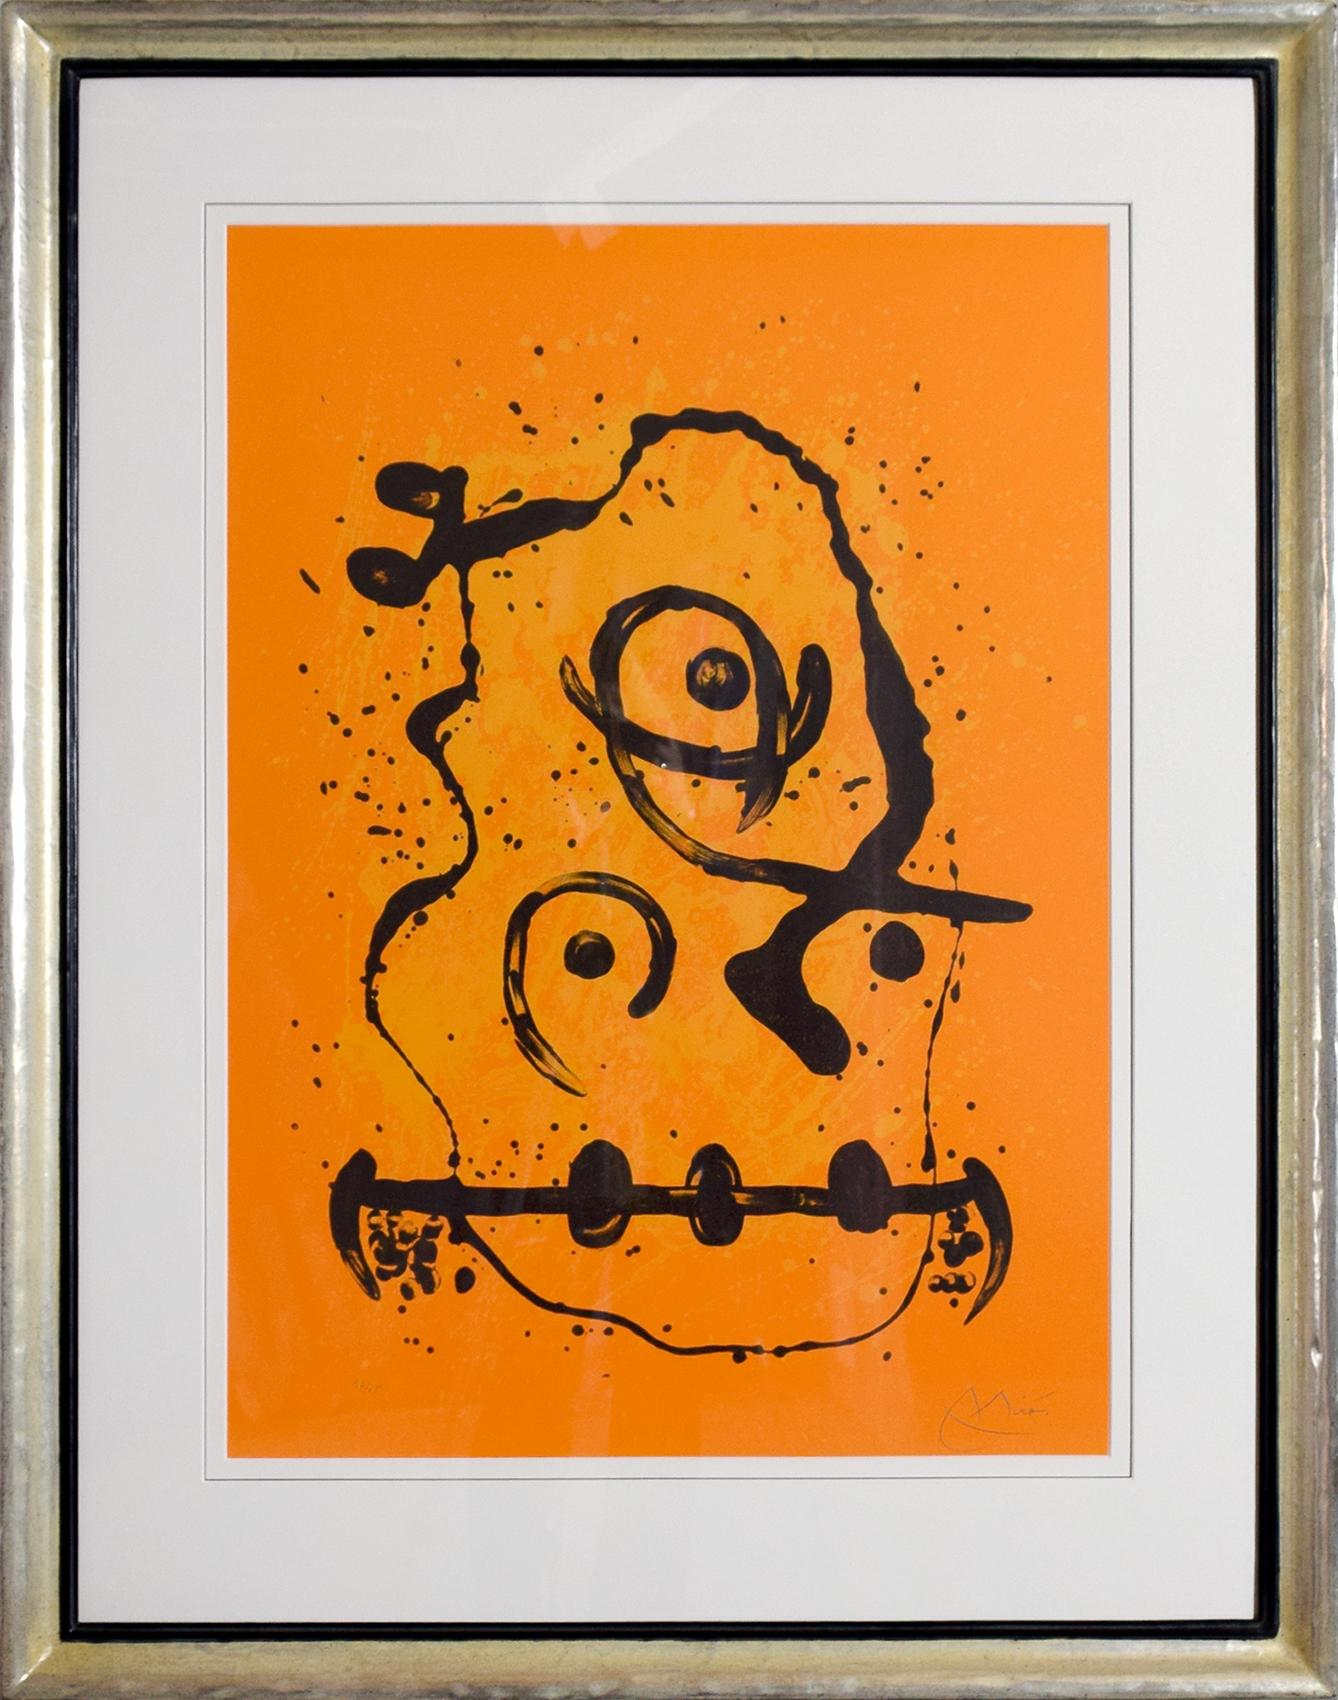 Joan Miró - Le Polyglotte - Orange , 0612-008-315